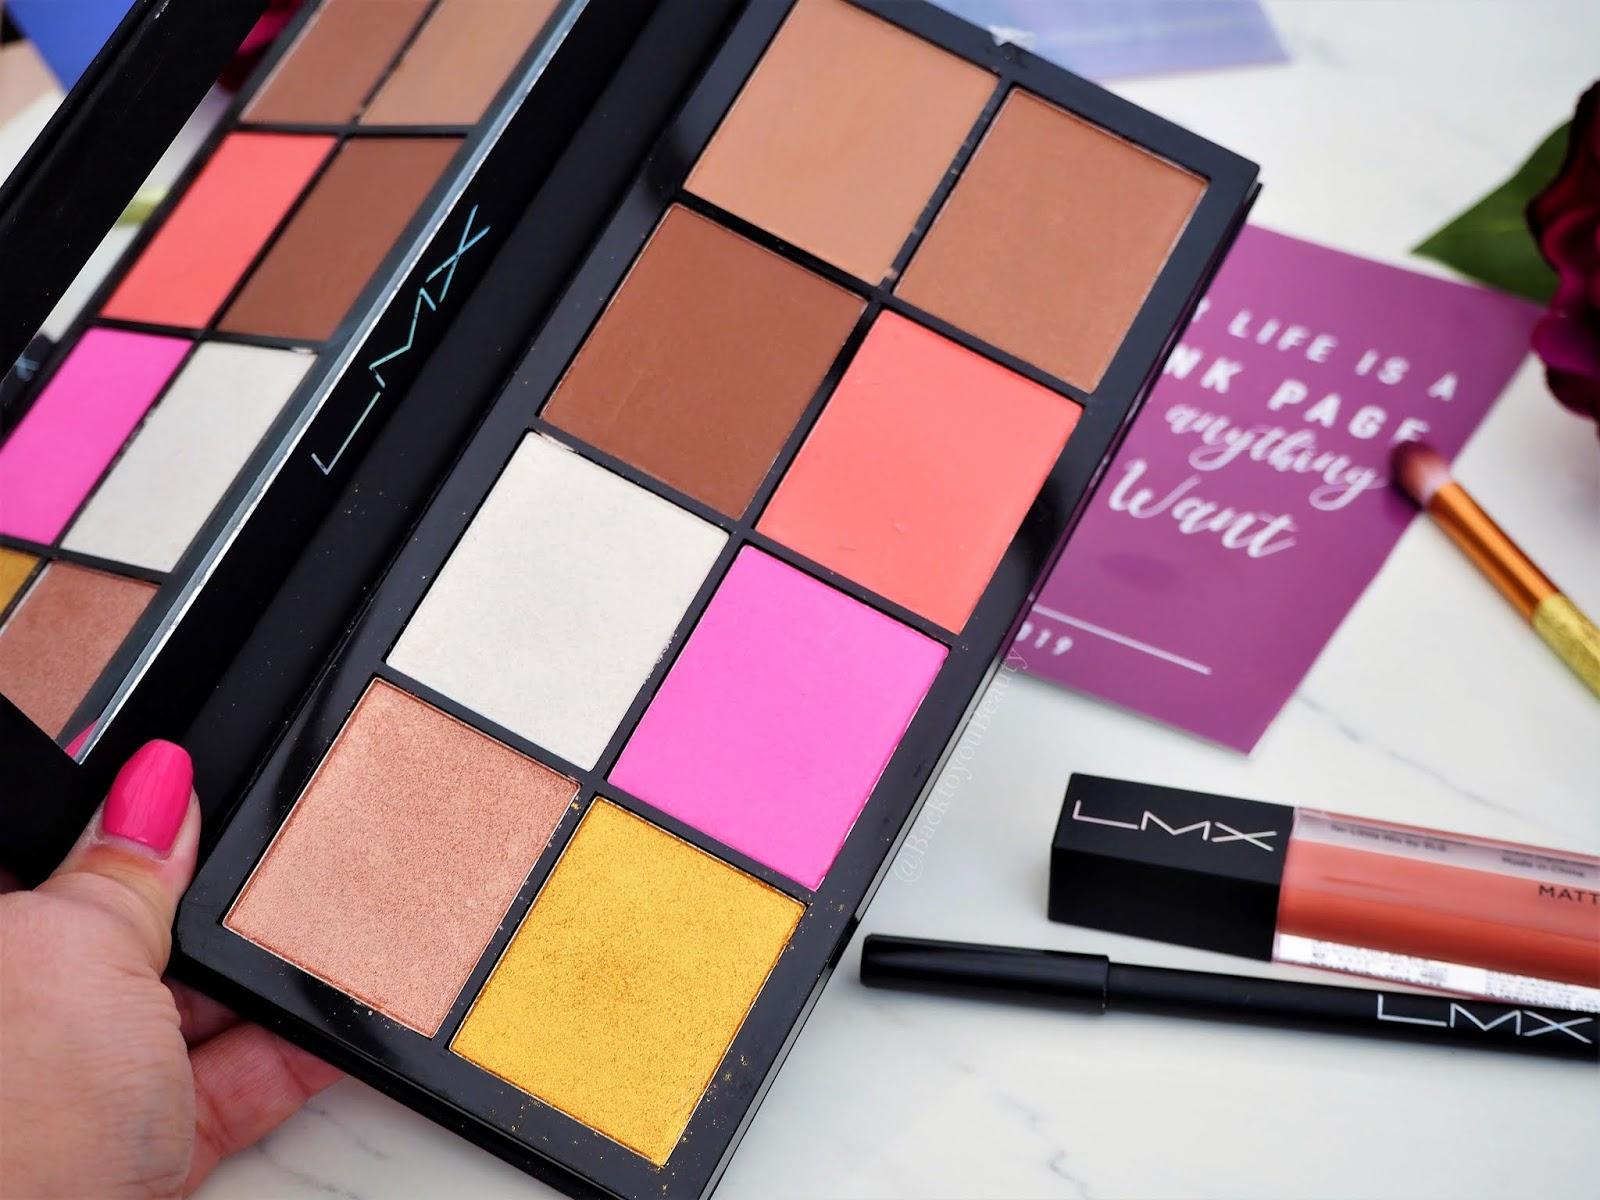 LMX Beauty Face Palette